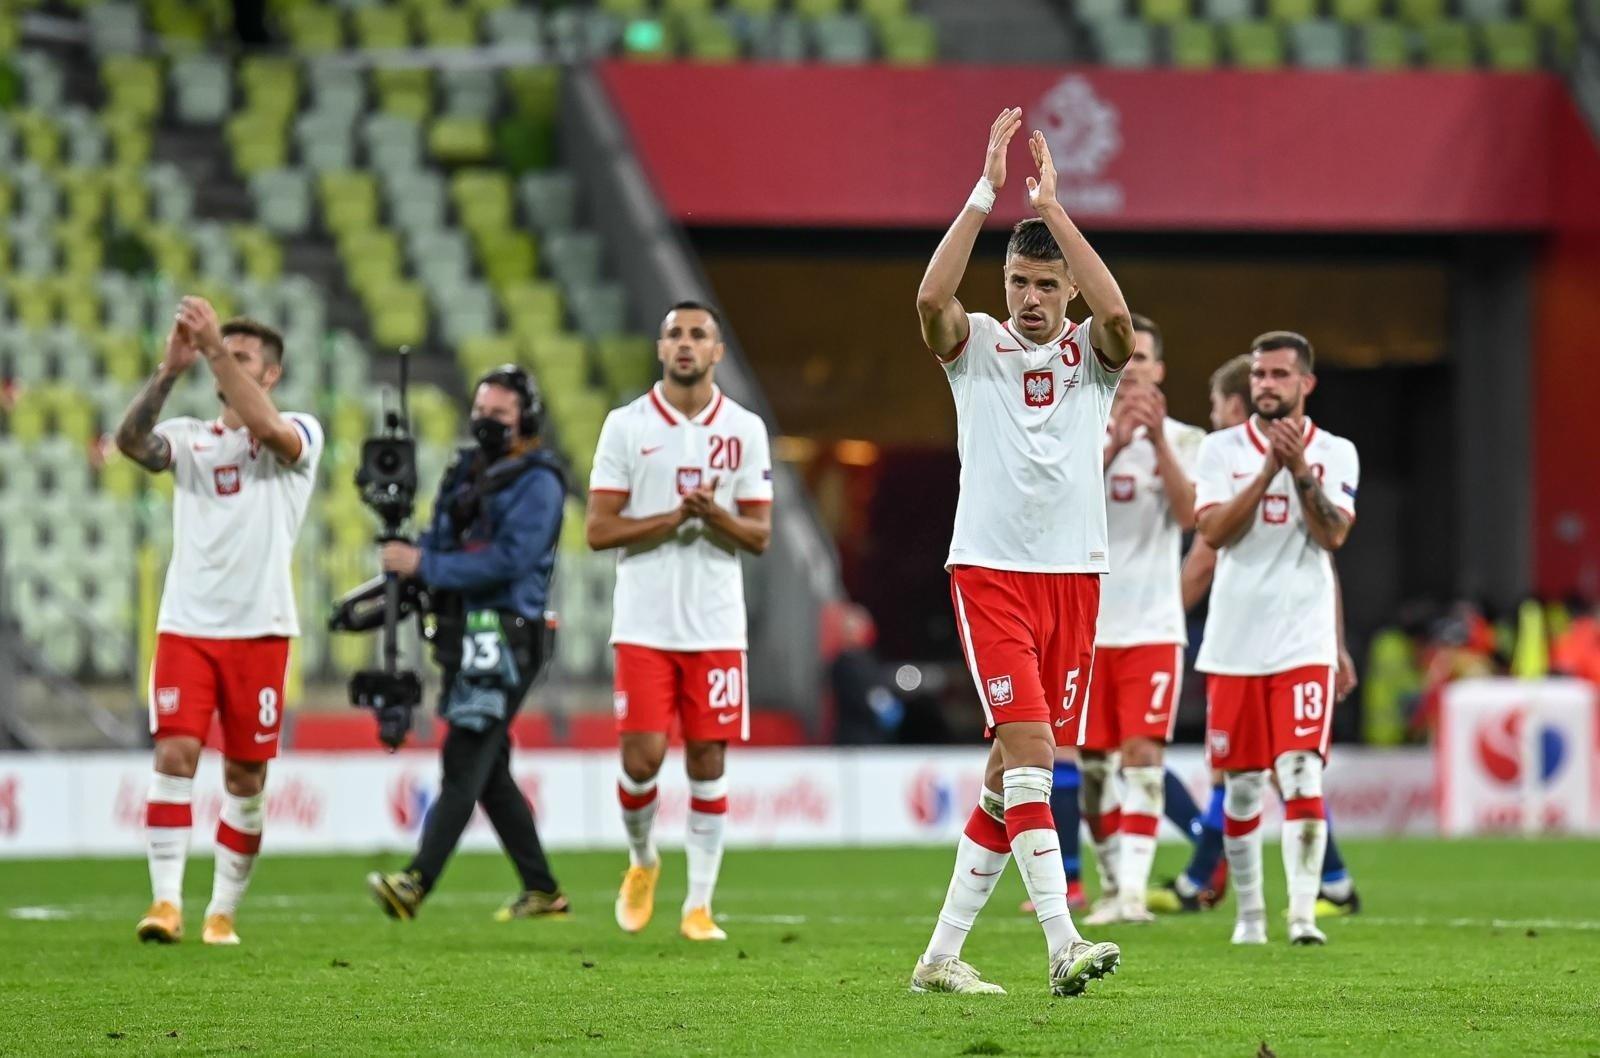 Mecz Polska Rumunia Live Stream